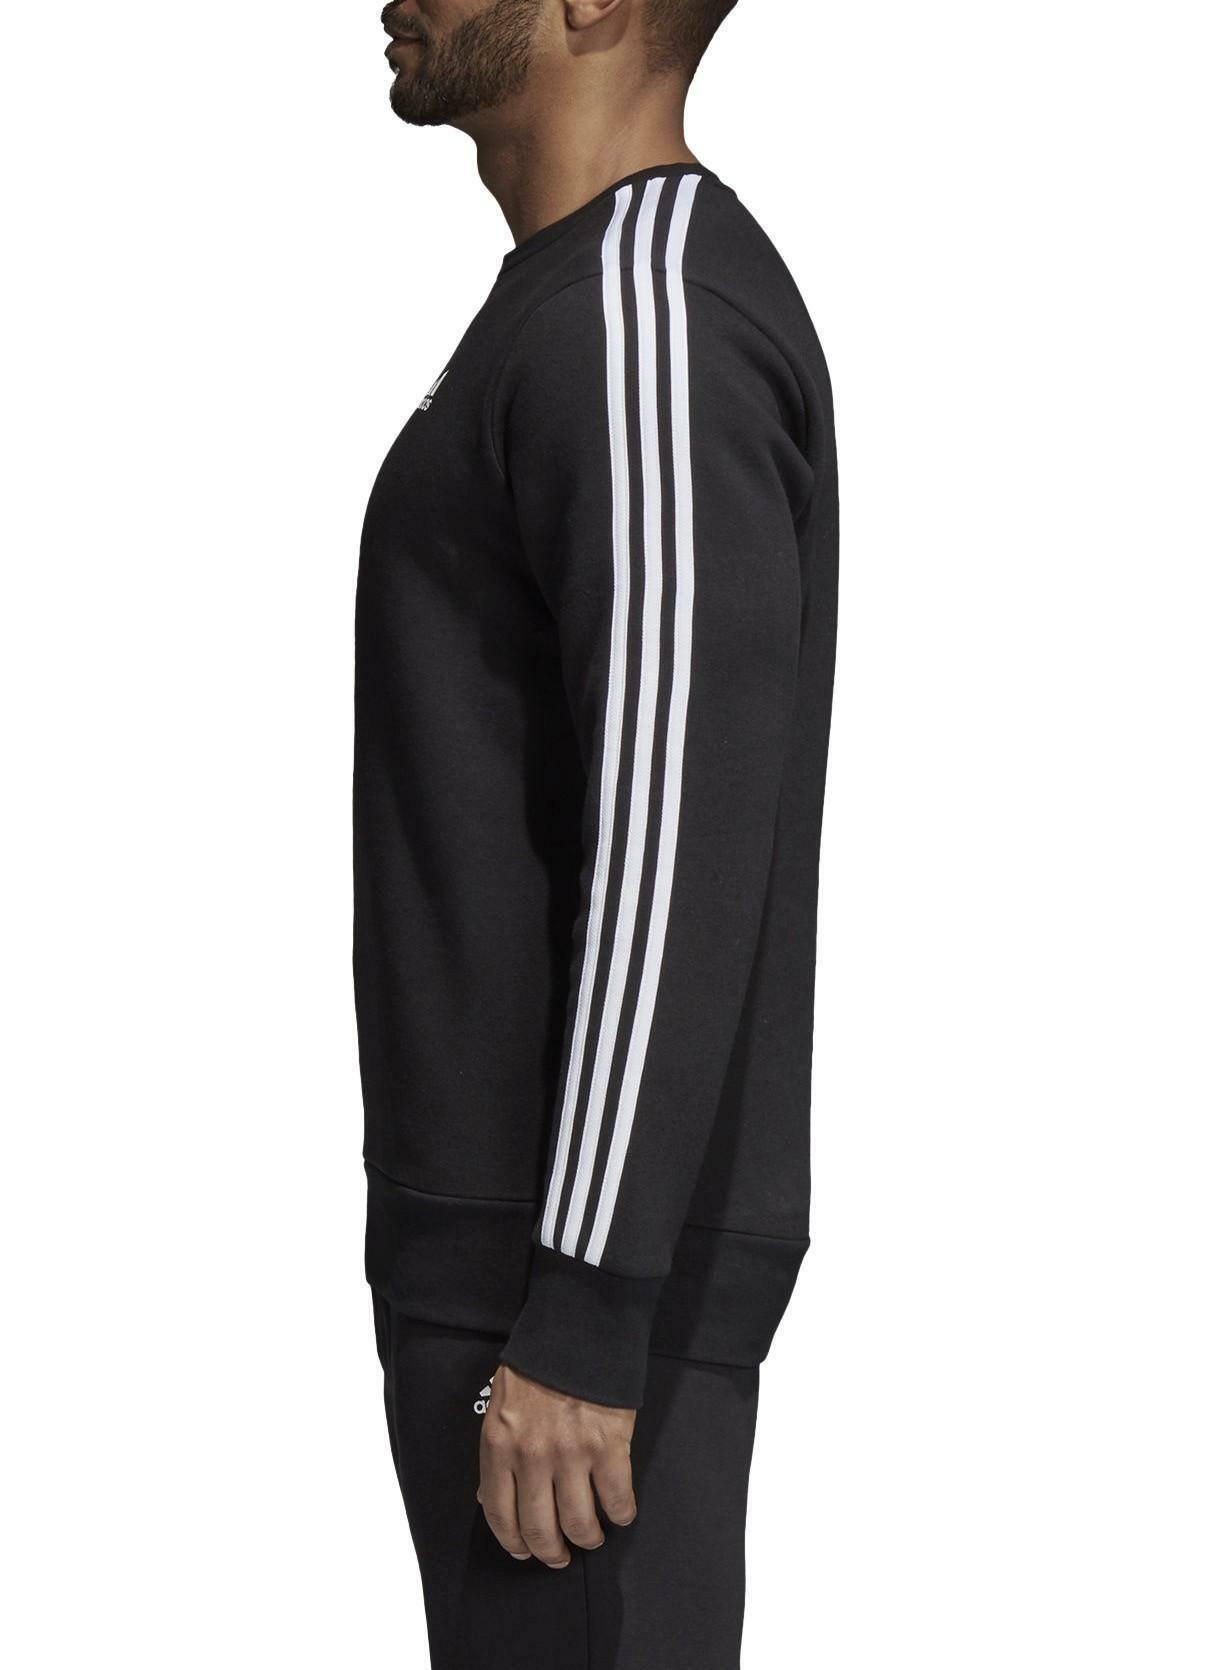 adidas adidas ess 3s crew felpa uomo nera felpata bq9645